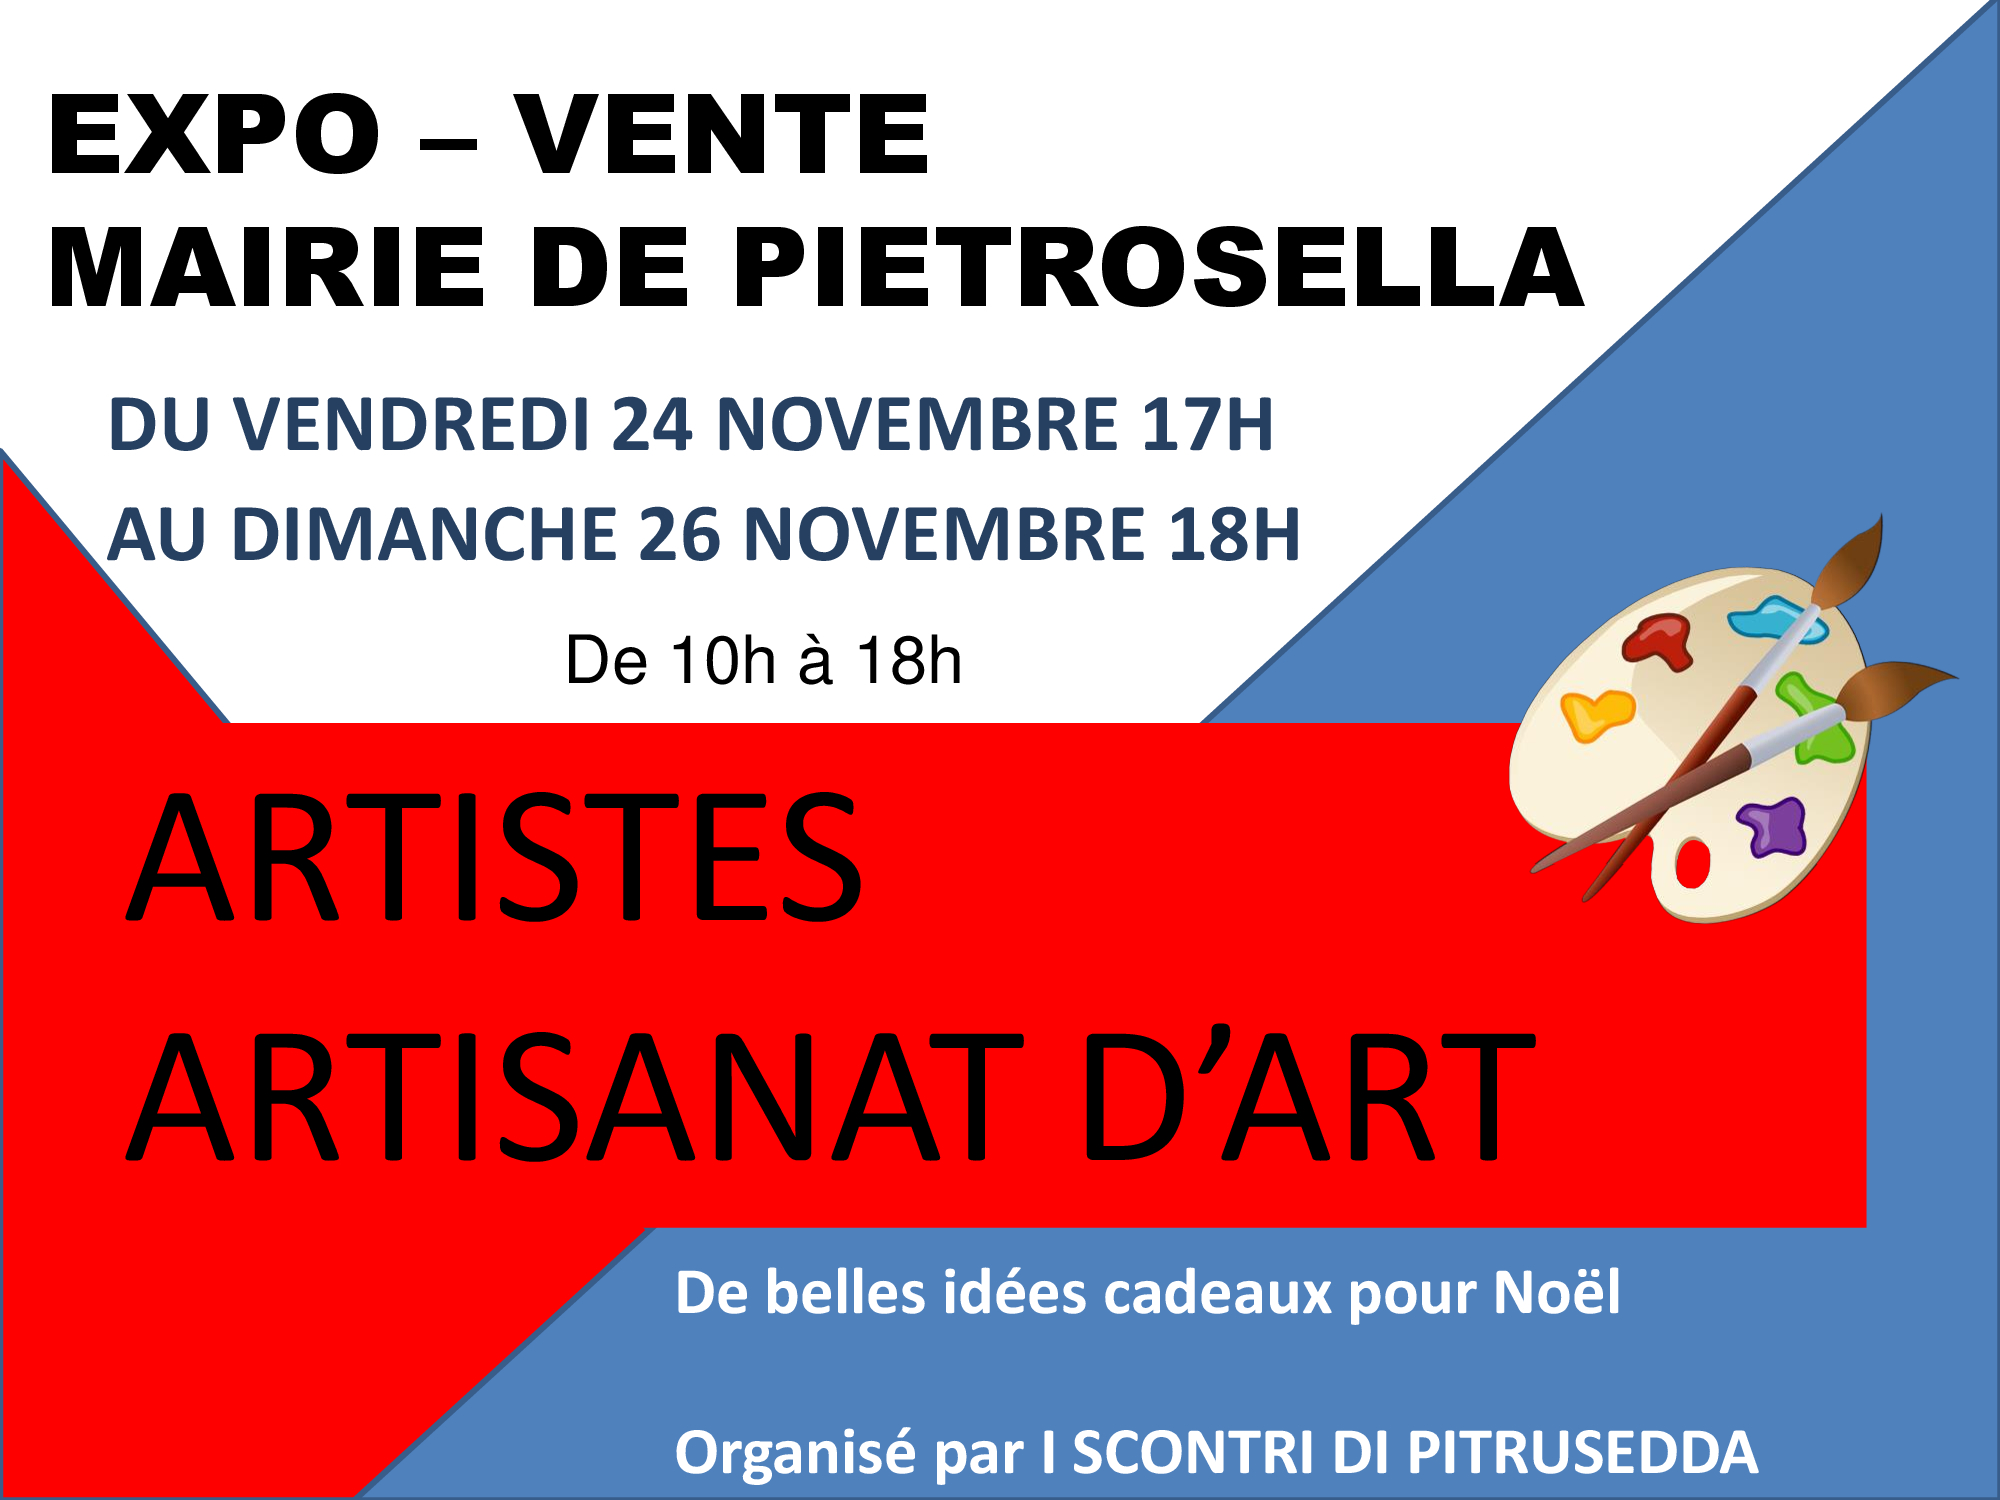 Expo-vente à la Mairie de Pietrosella